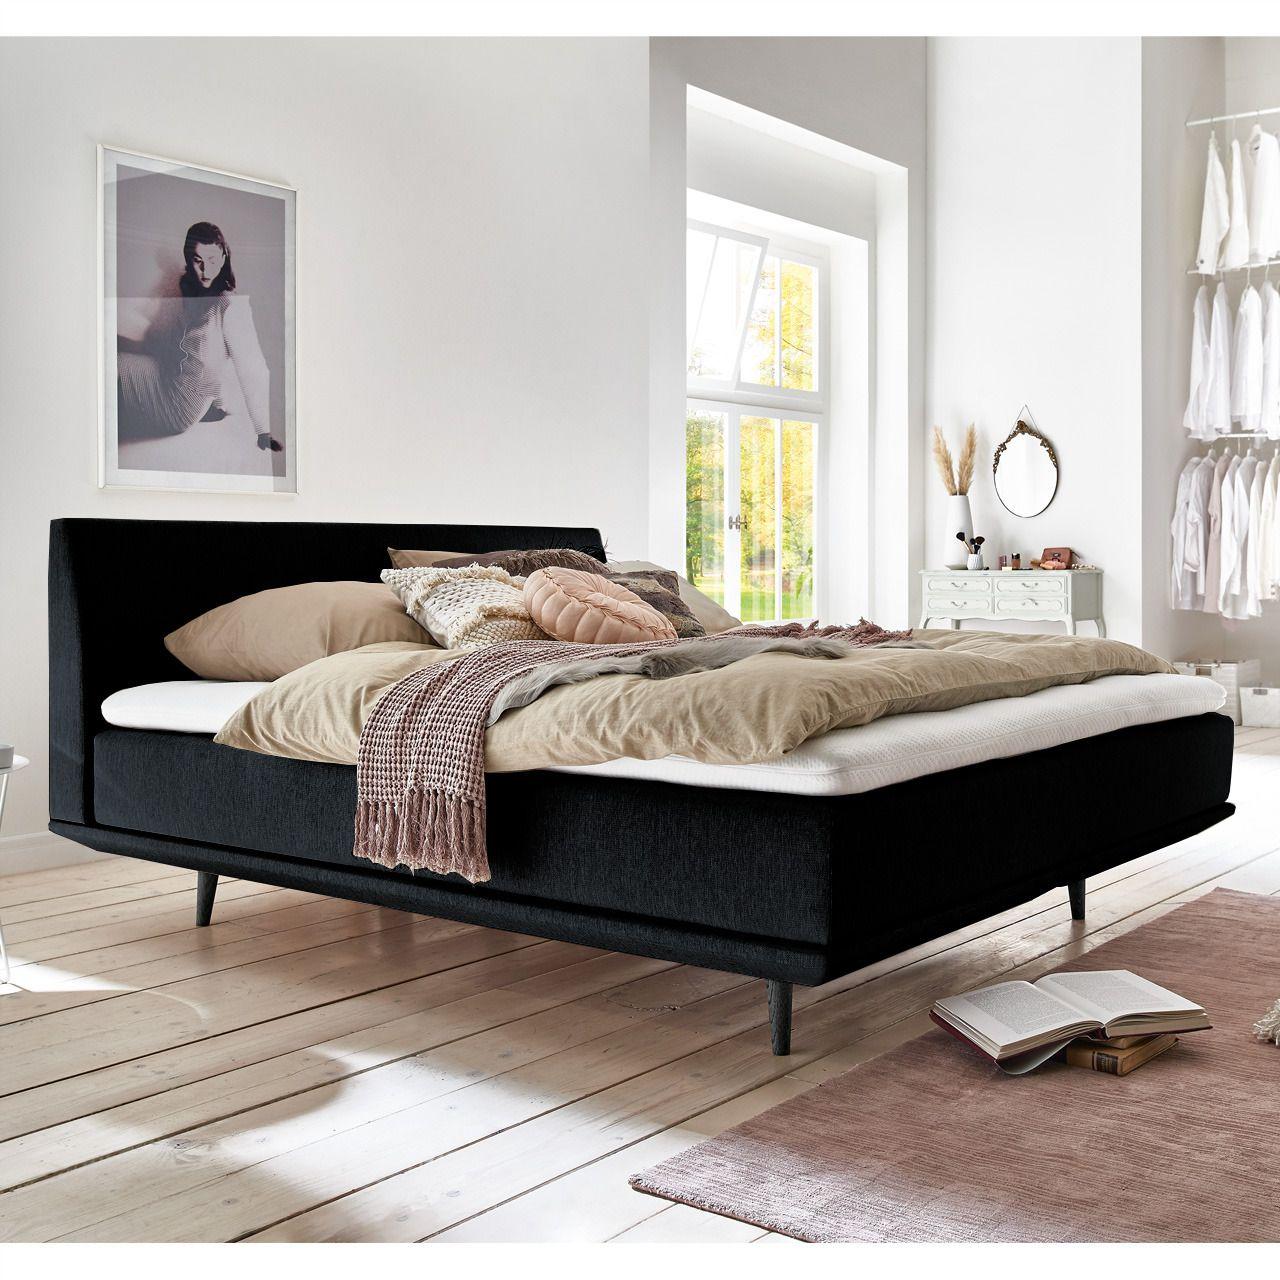 Minimum Collection Piano Black Boxspringbett Bett Kopfteil Bett